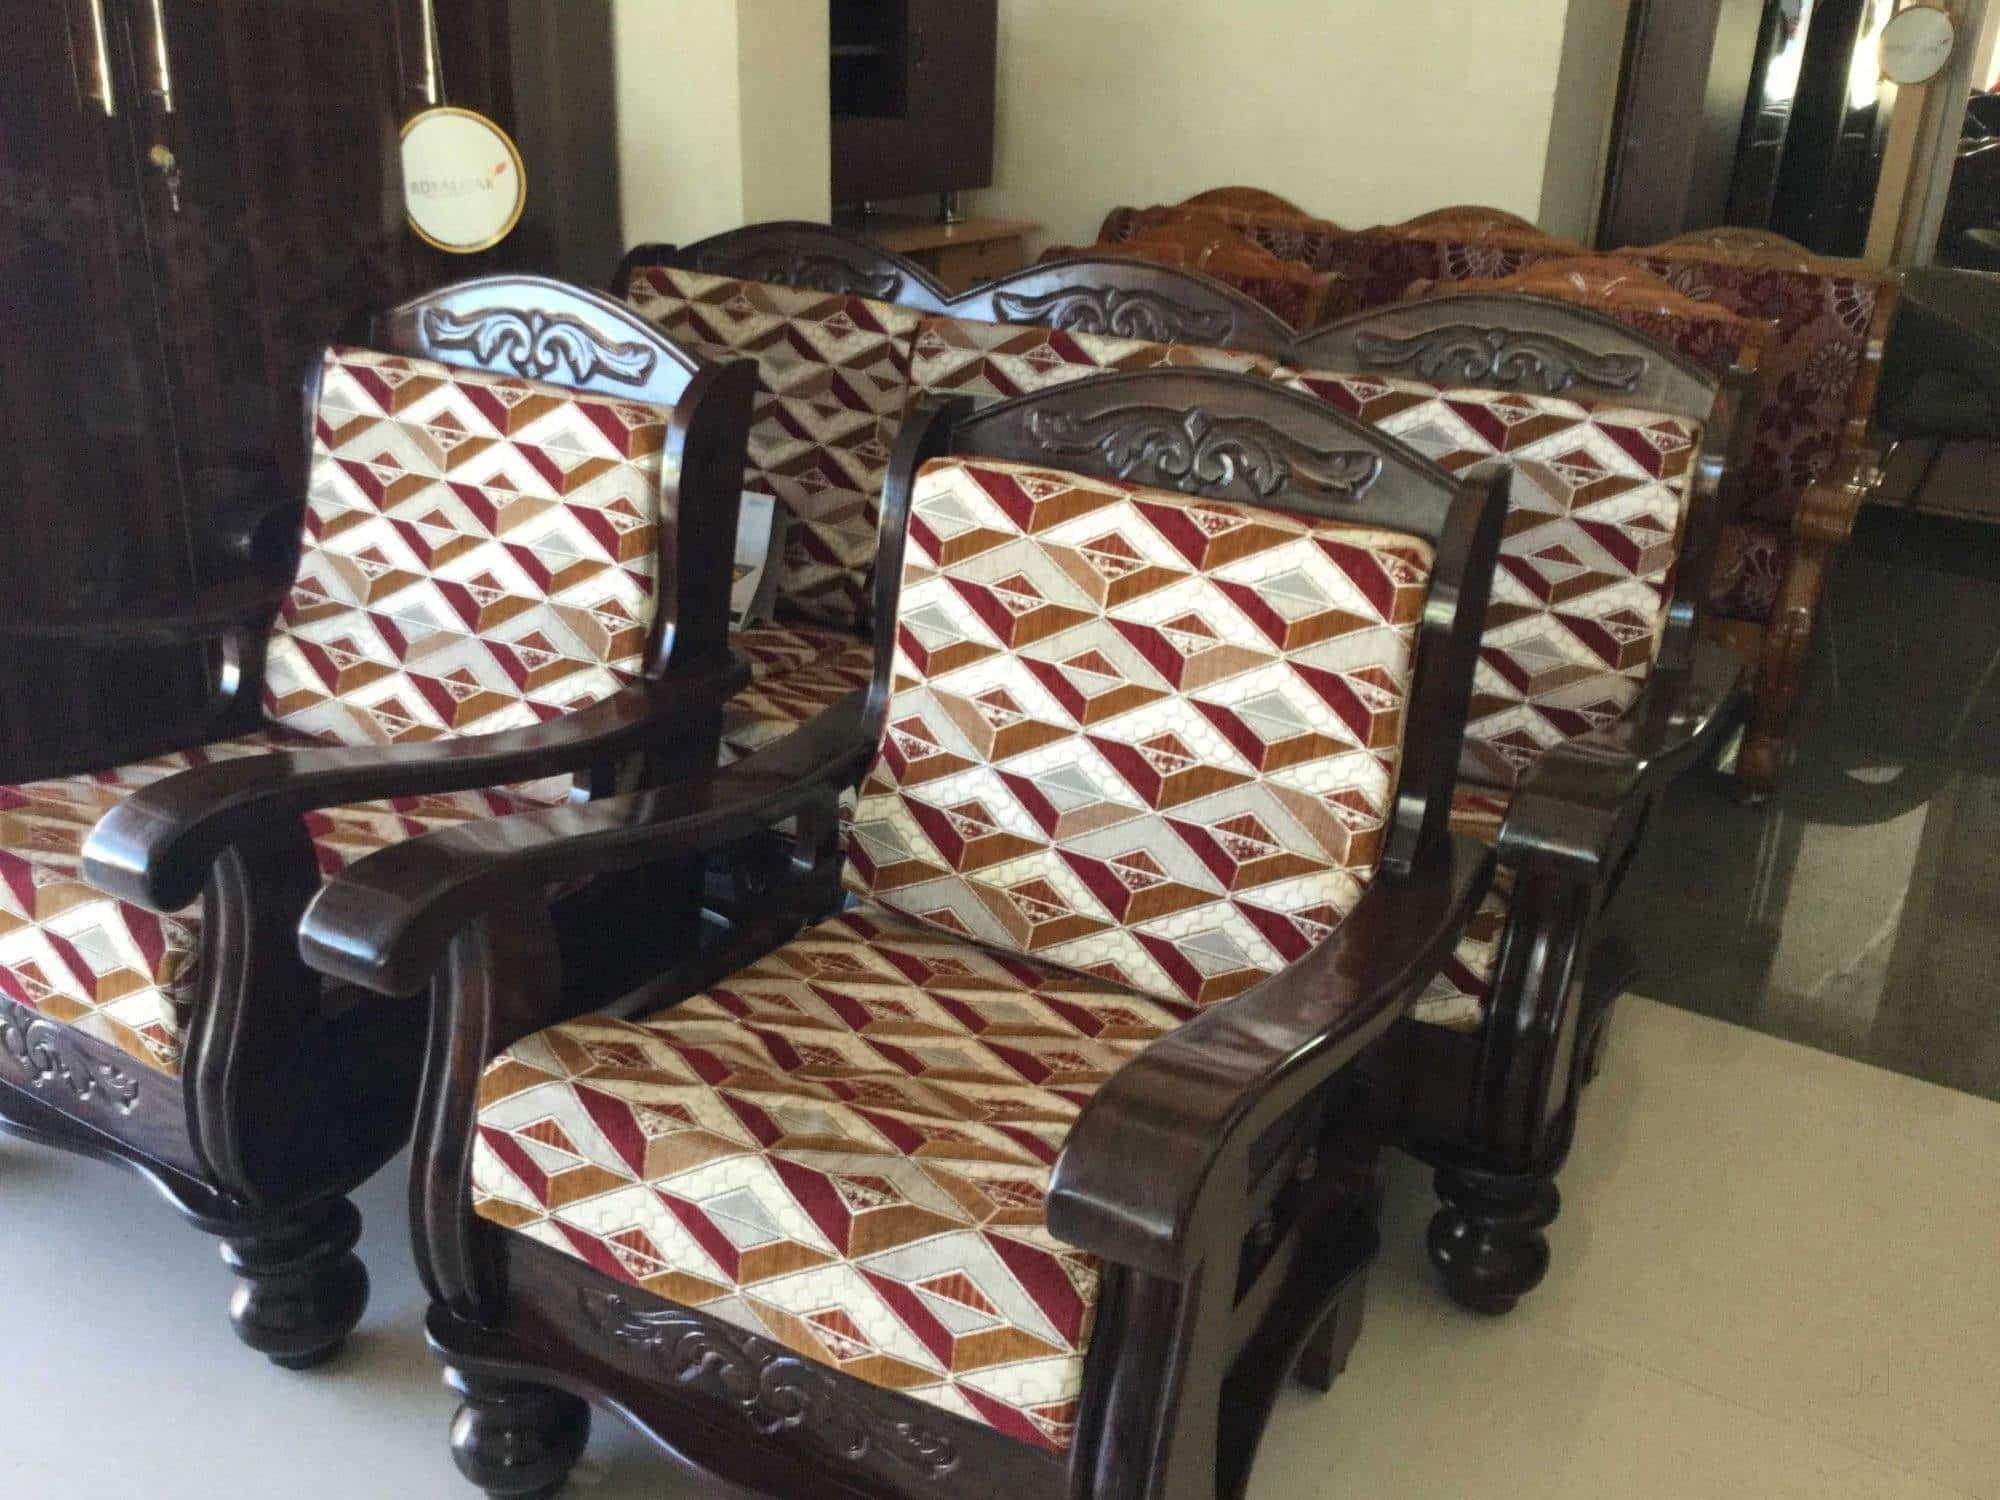 Balaji Furnitures Dattagalli Furniture Dealers in Mysore Justdial